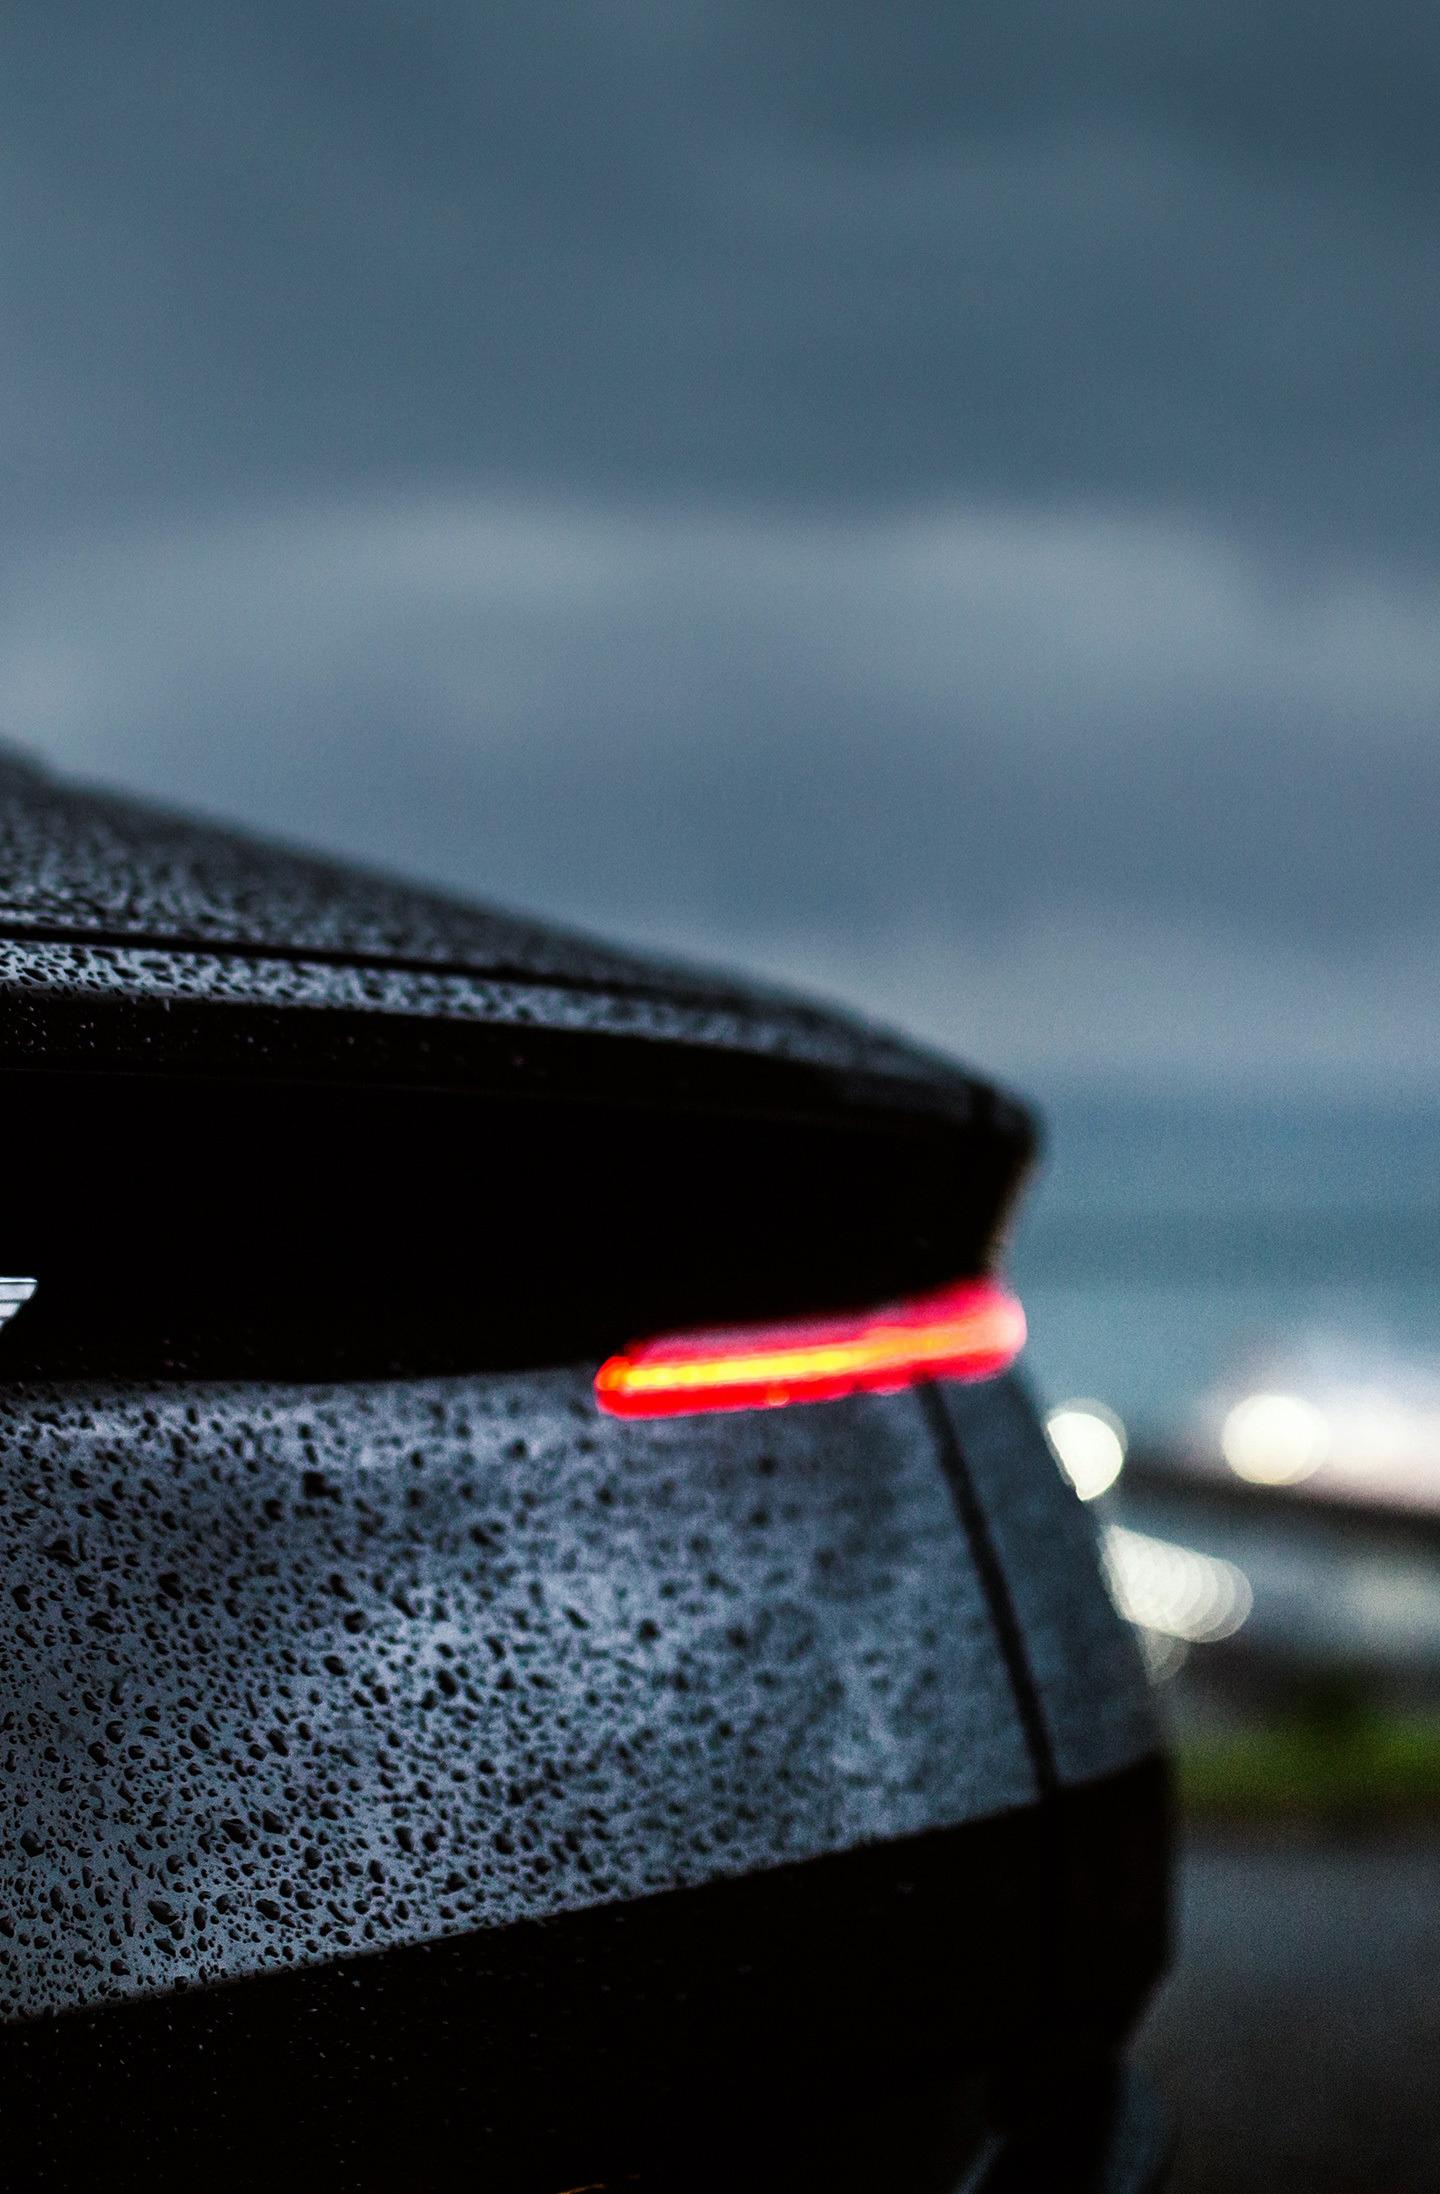 Download 1440x2630 Wallpaper Aston Martin Db11 Drops Rain Rear Taillight Samsung Galaxy Note 8 1440x2630 Hd Image Background 2170